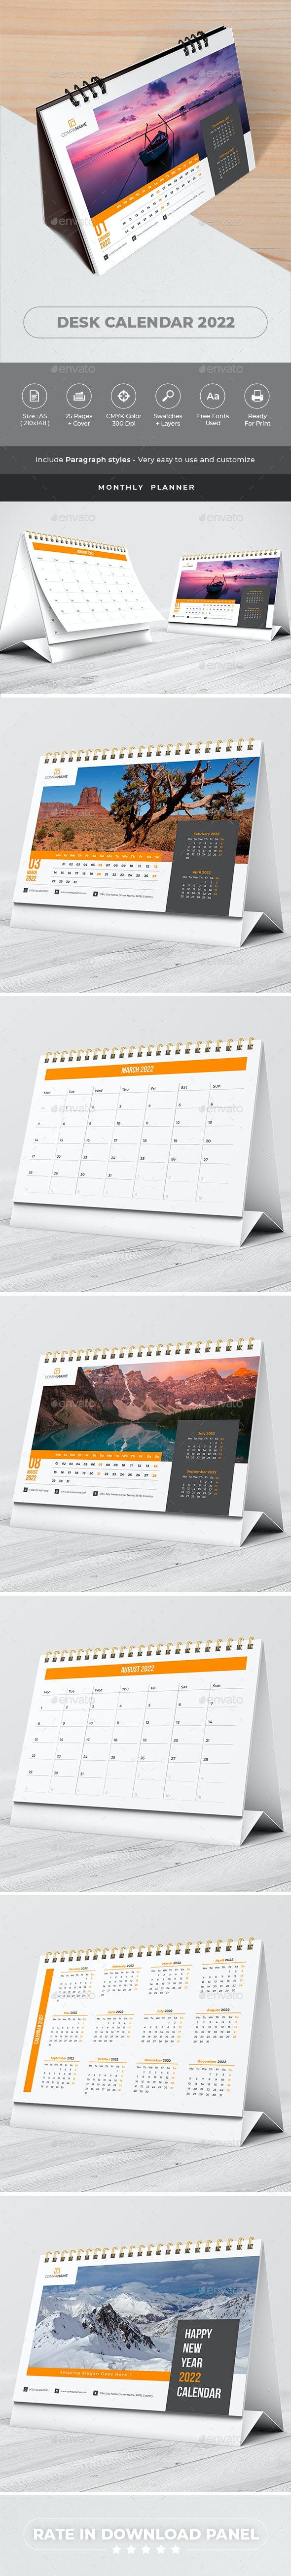 Desk Calendar 2022 Planner - Calendars Stationery